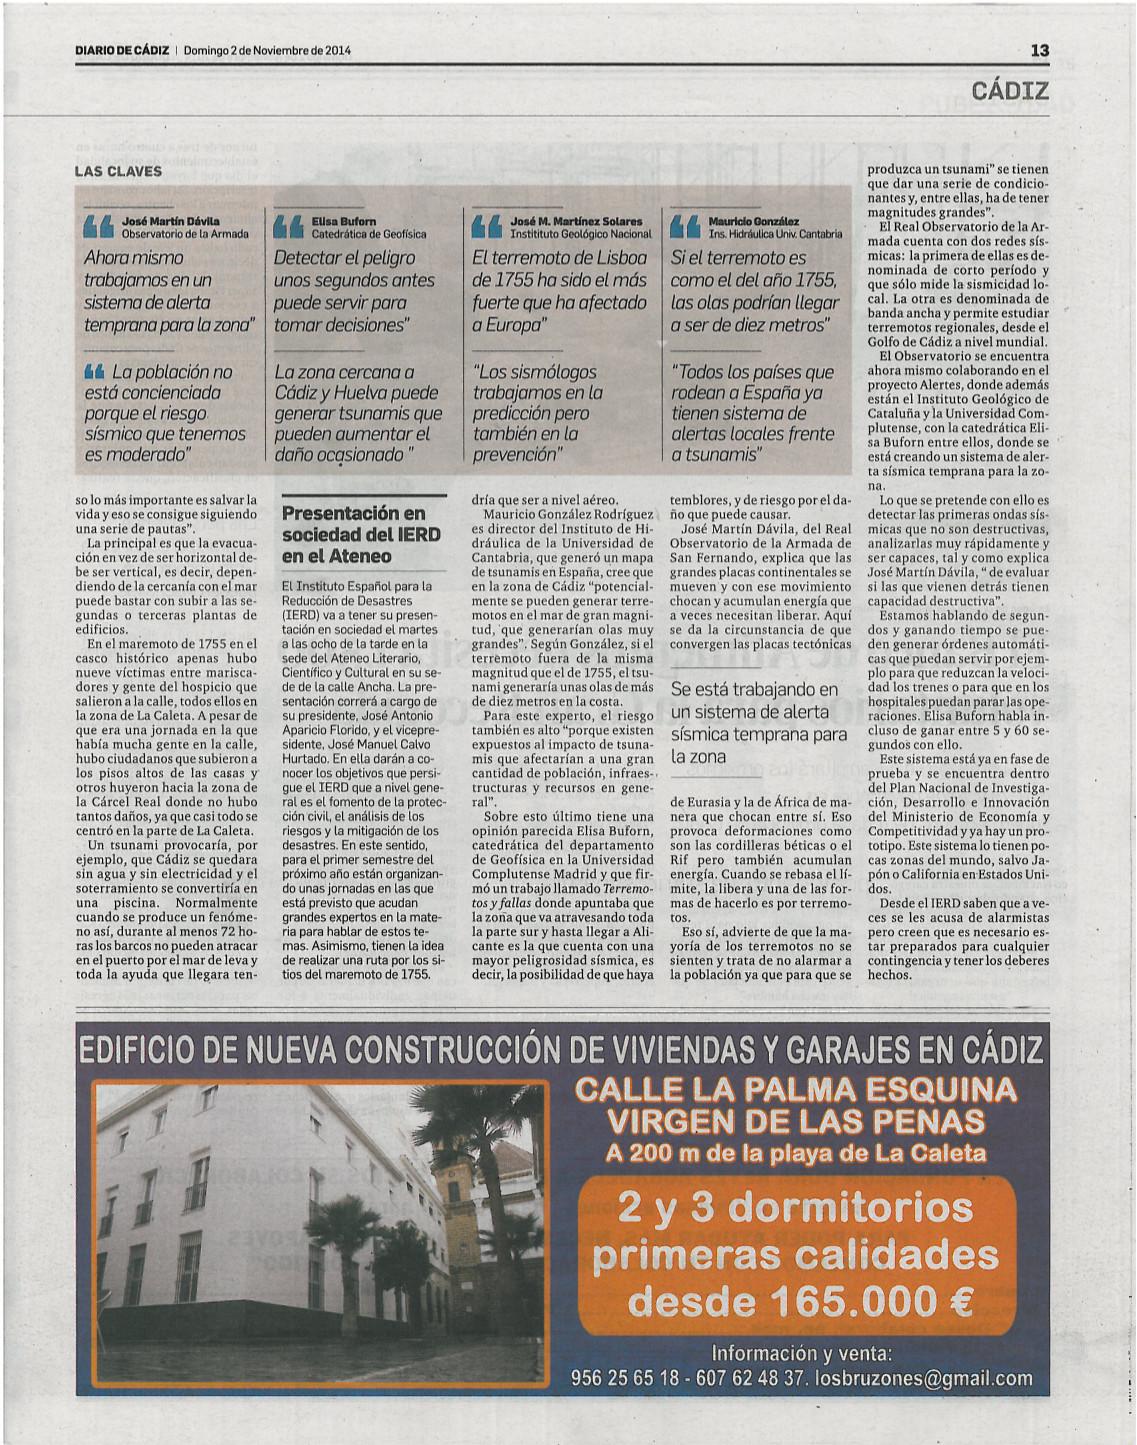 20141102-DiariodeCadiz-2